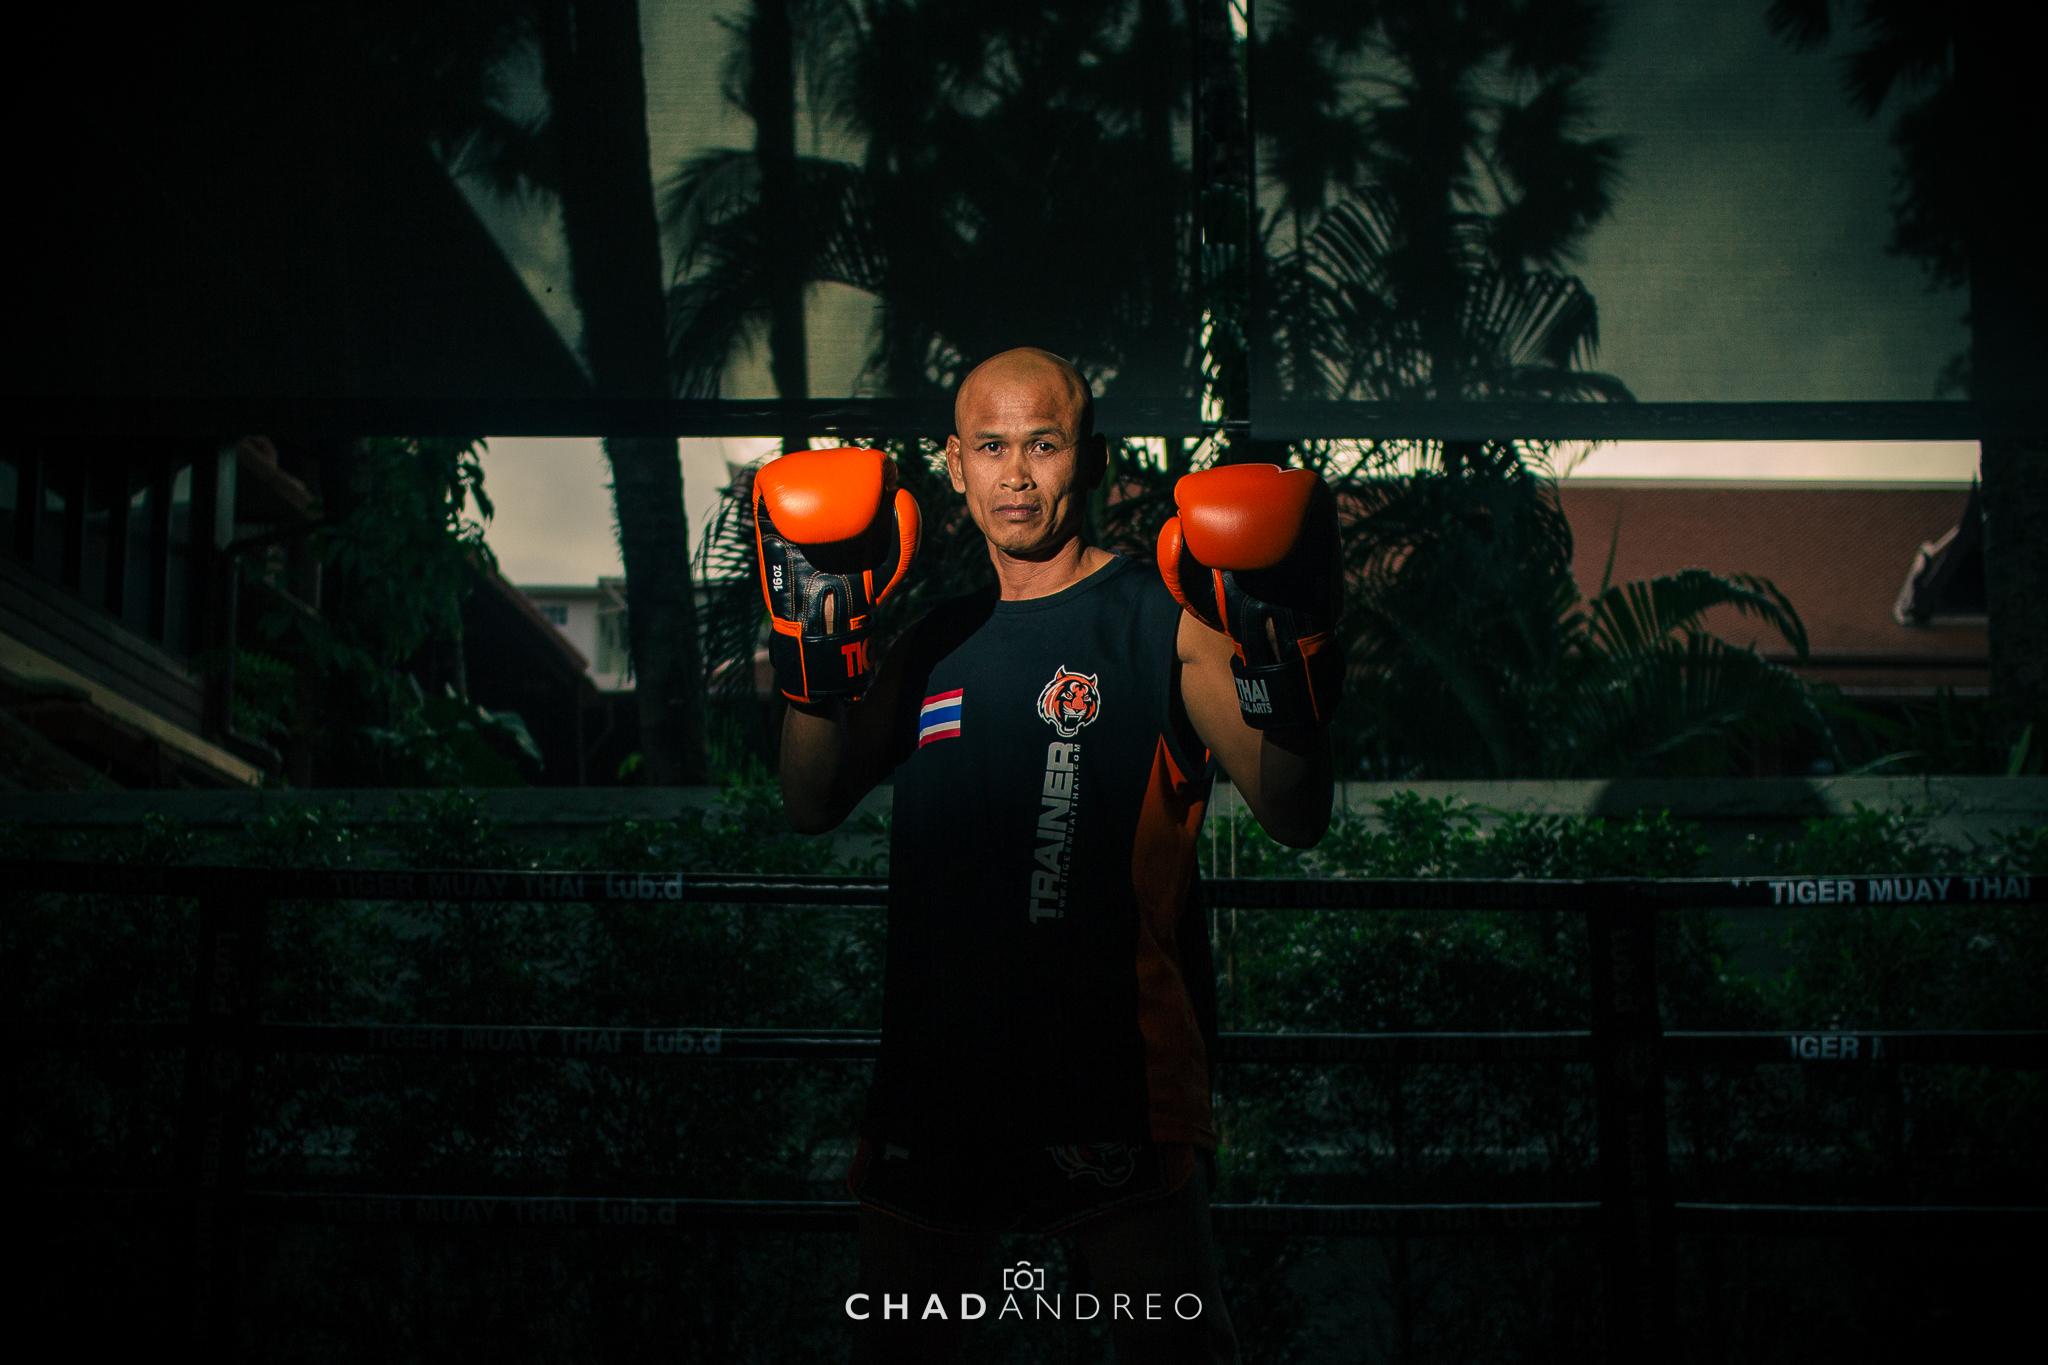 Chad-Andreo-Travel-Photography-9423.jpg